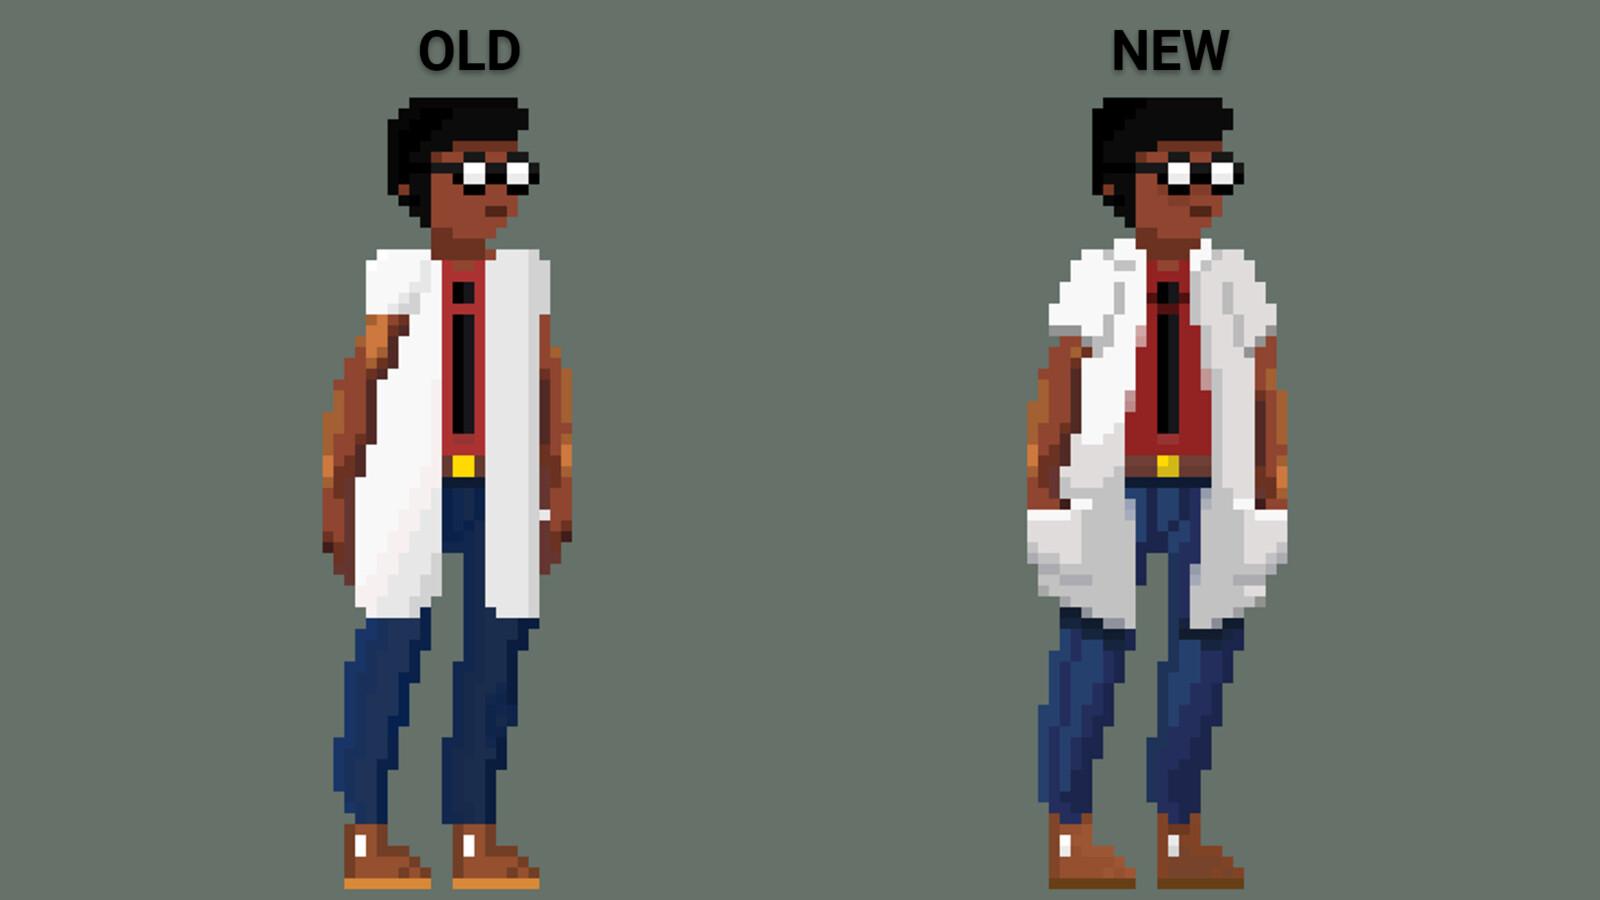 Comparison of the old version vs the new.